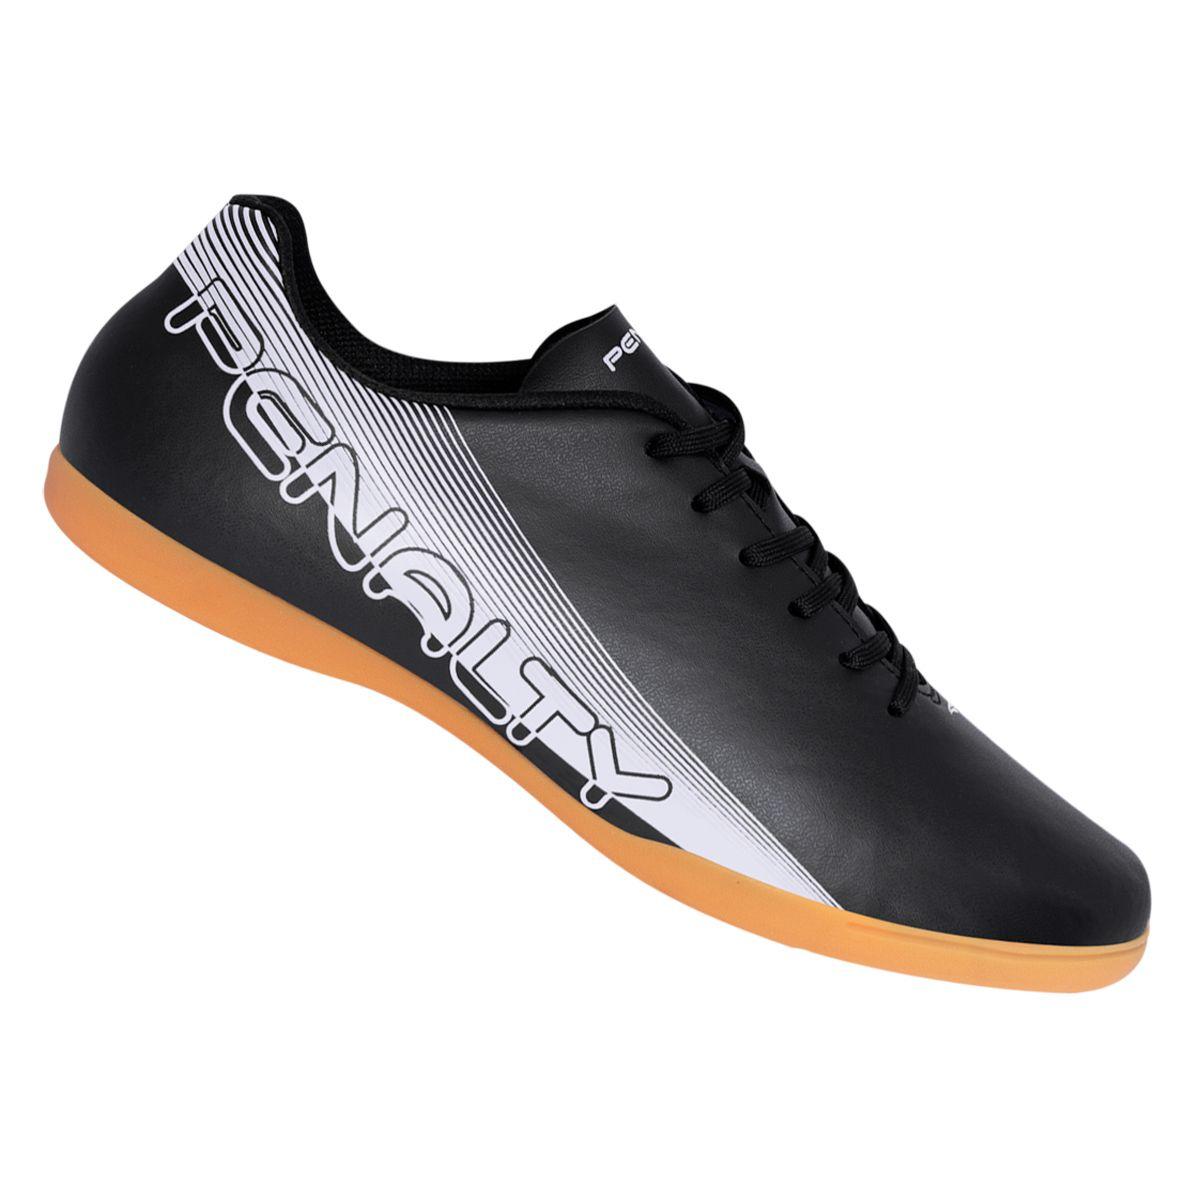 Calçado Futsal Penalty Bravo XX 124202-9800